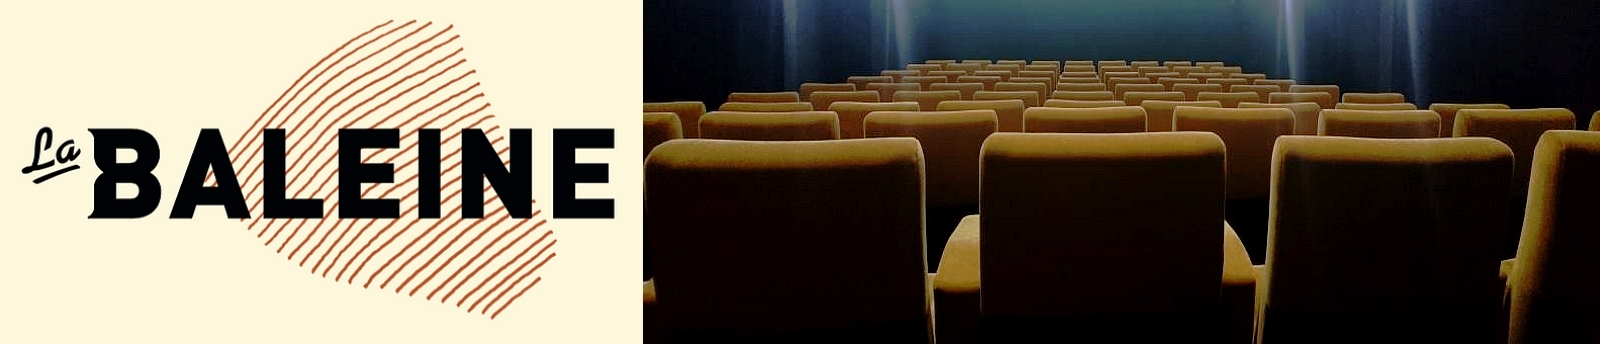 cinema-baleine_pano.jpg